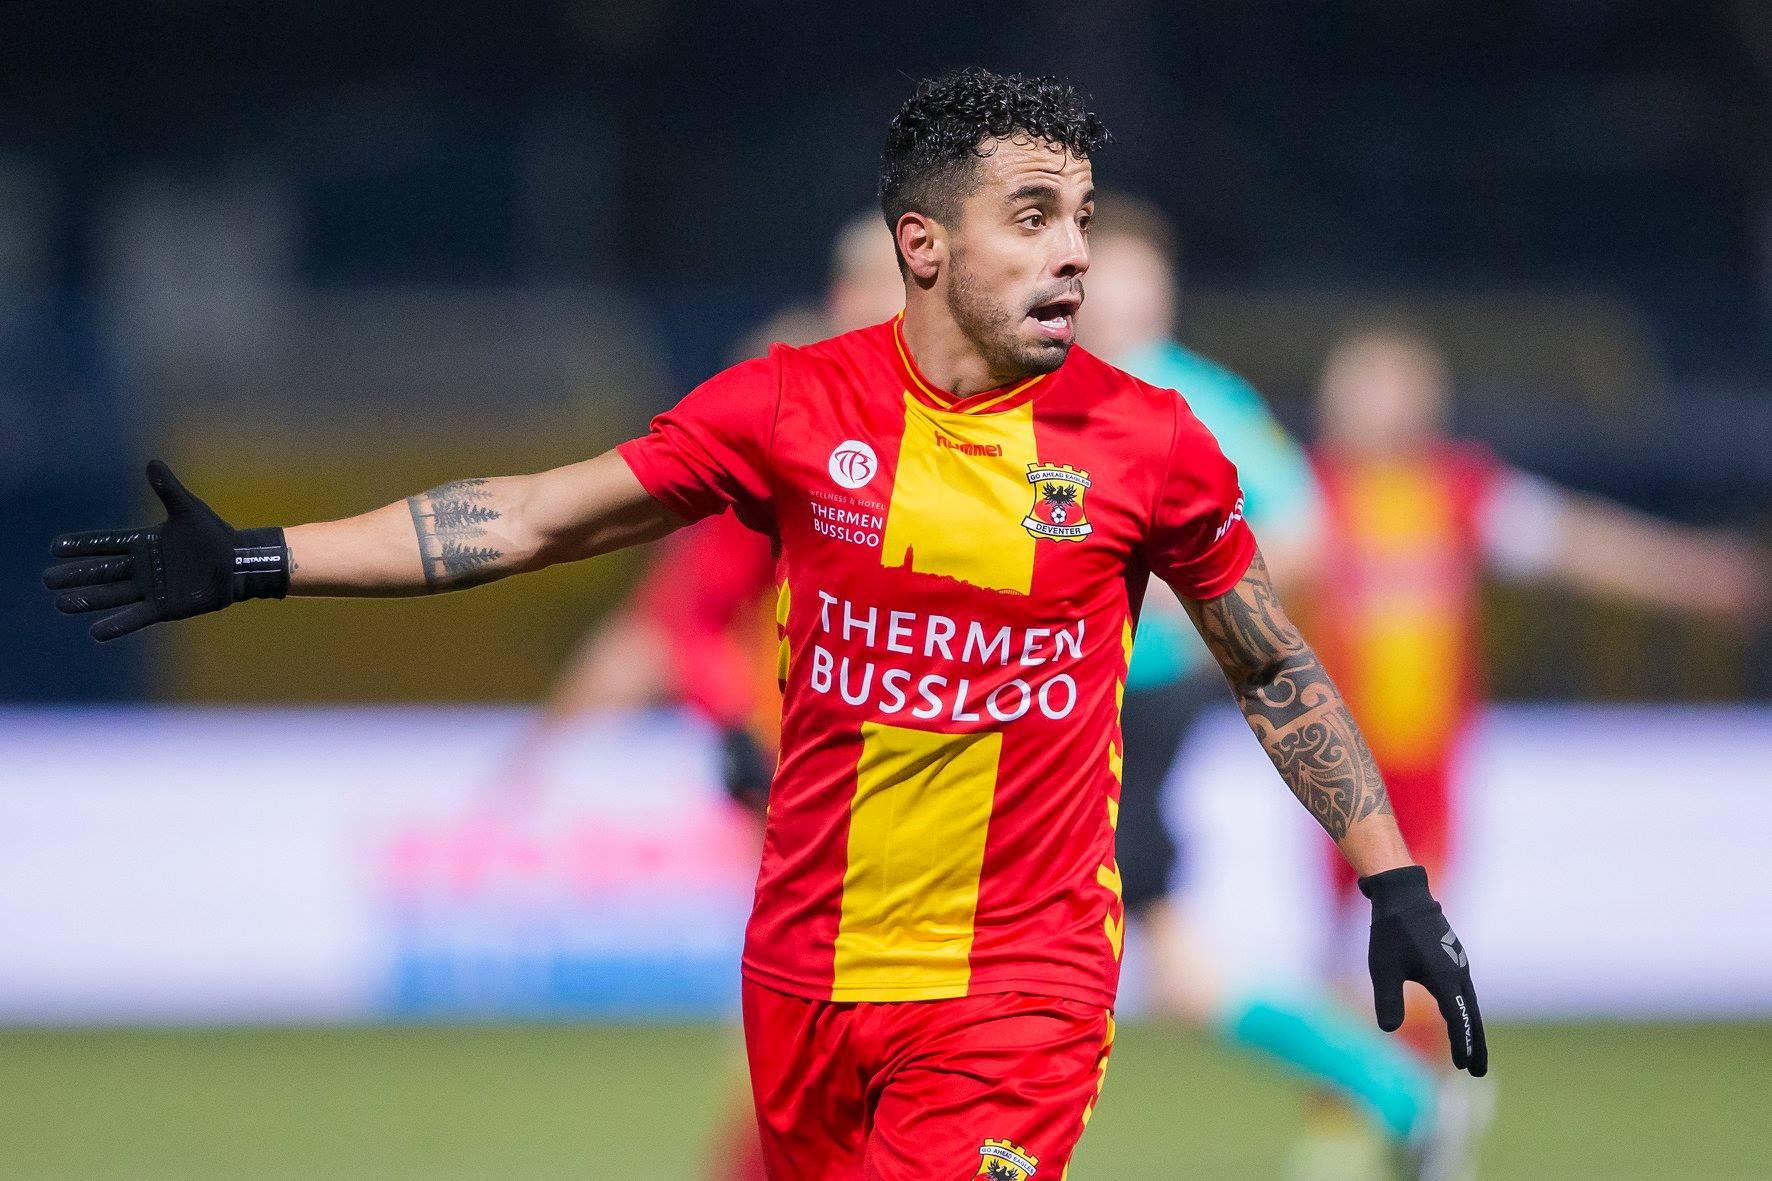 Pronostici Eerste Divisie 7 settembre: analisi, news e pronostici su tutti i match in programma da venerdì 7 settembre 2018 in Olanda B